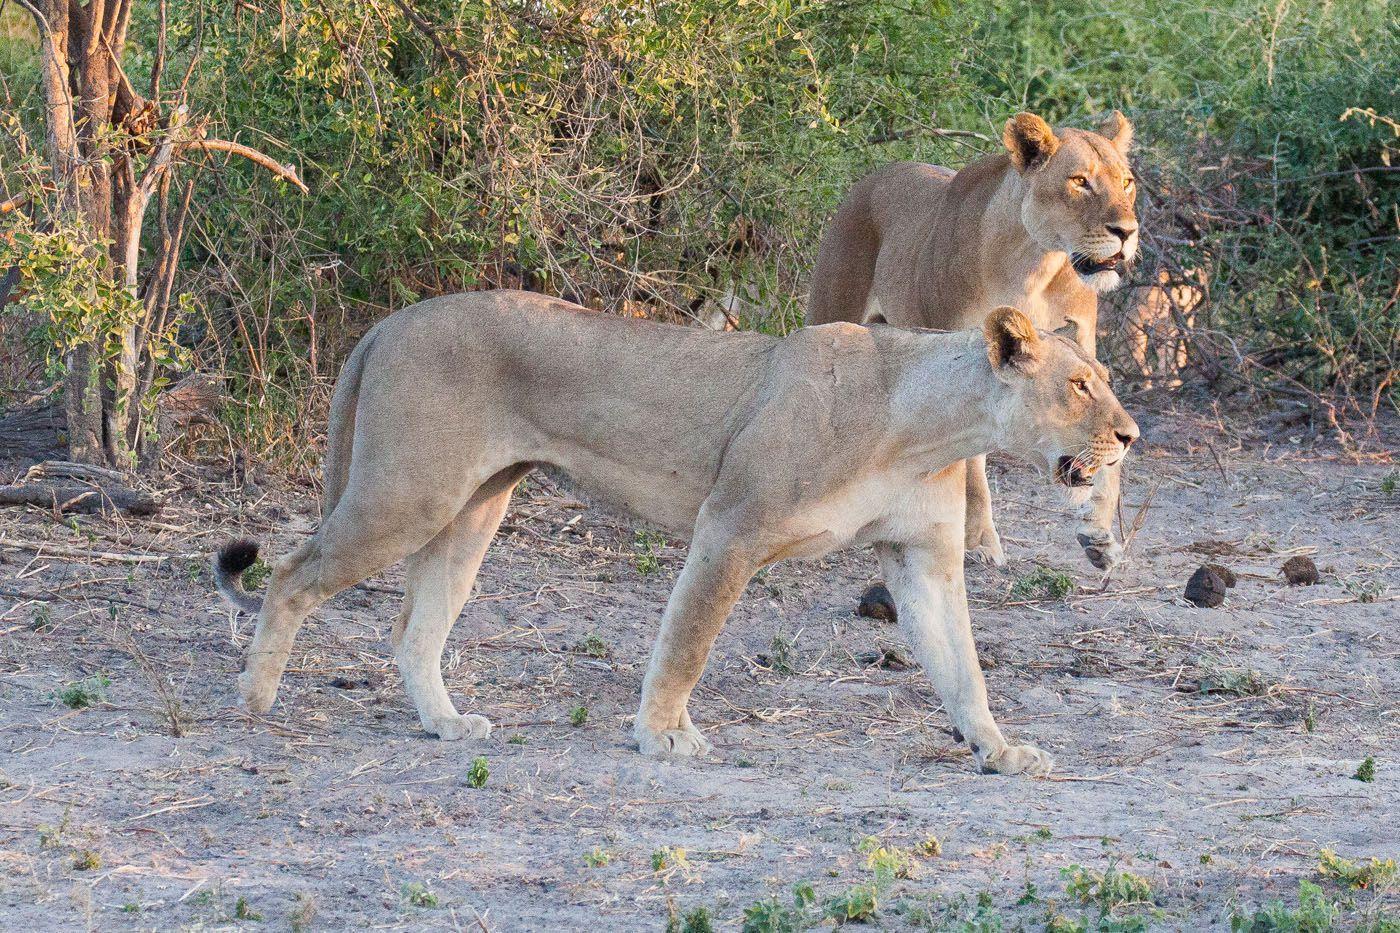 Lions Chobe Safari